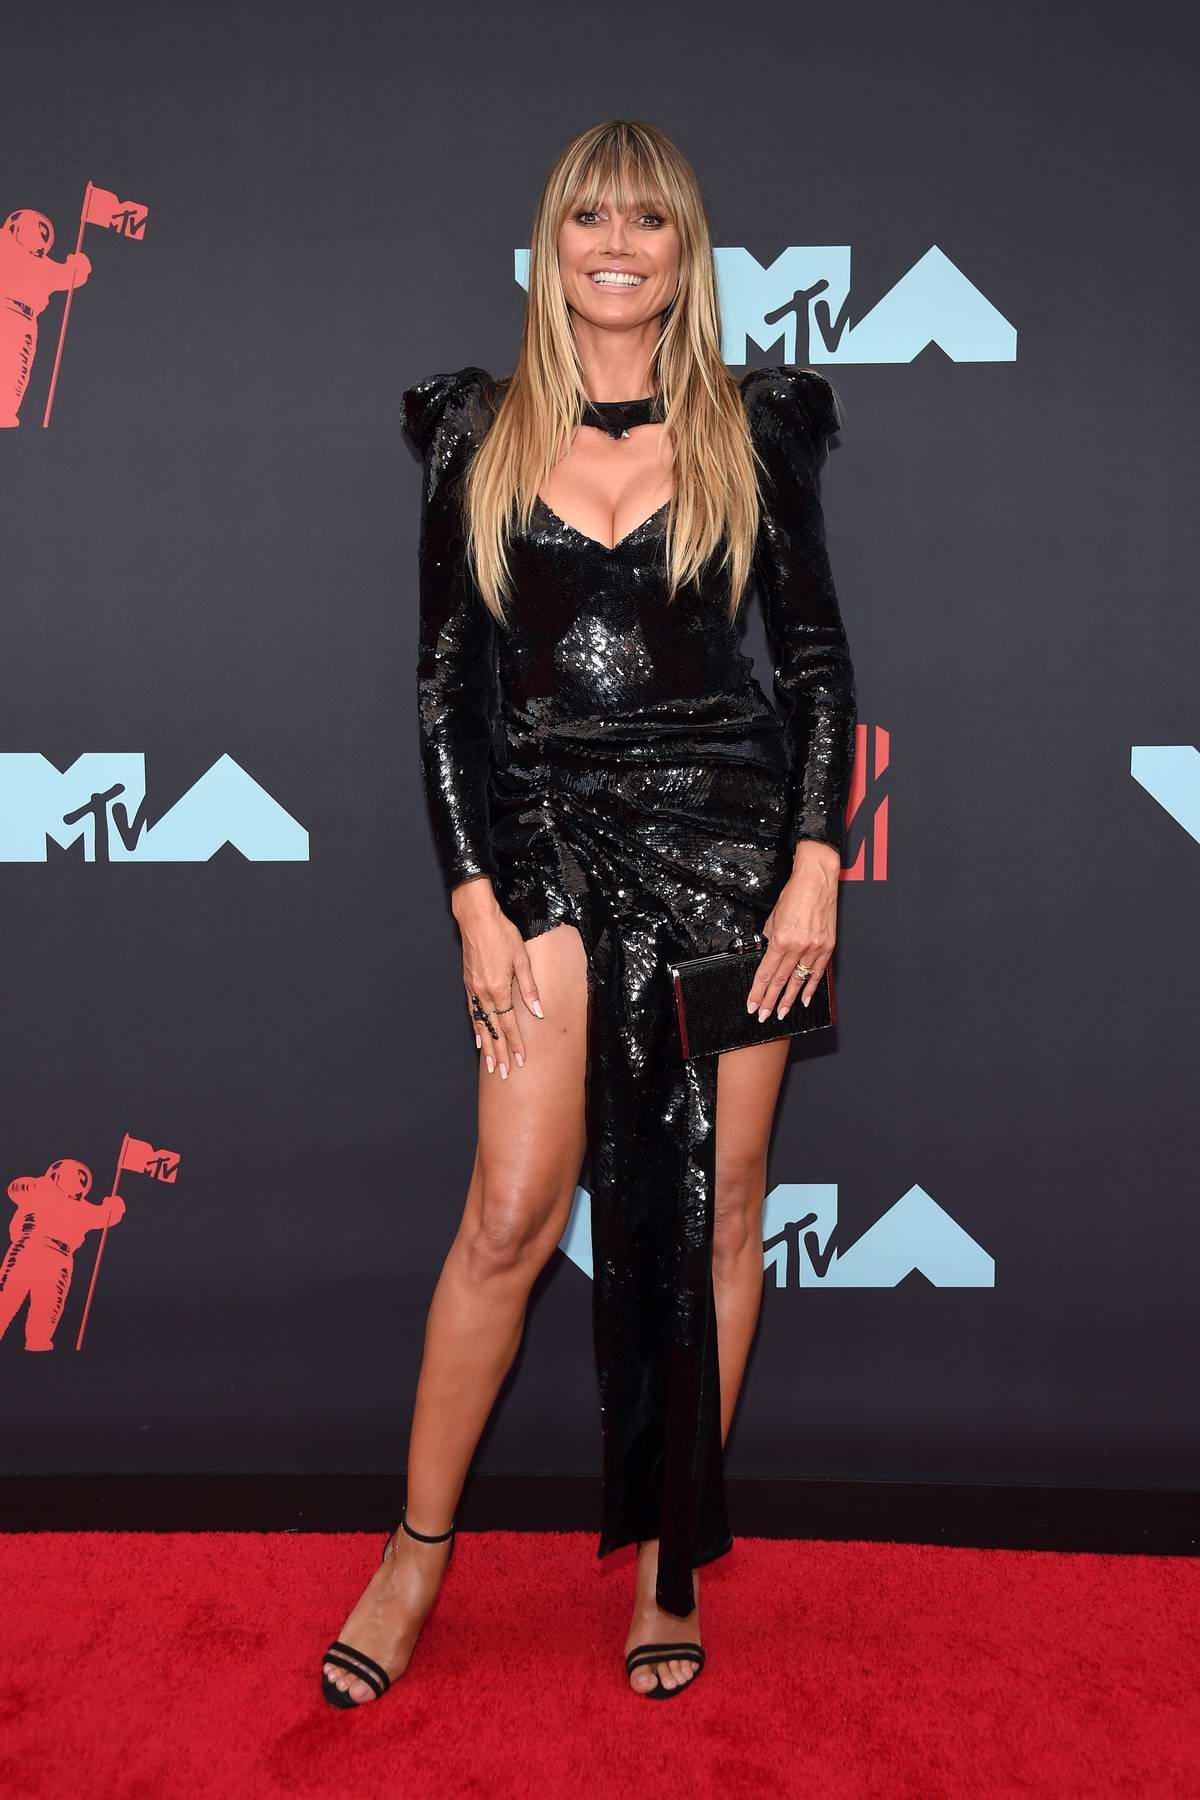 Heidi Klum attends the 2019 MTV Video Music Awards at Prudential Center in Newark, New Jersey